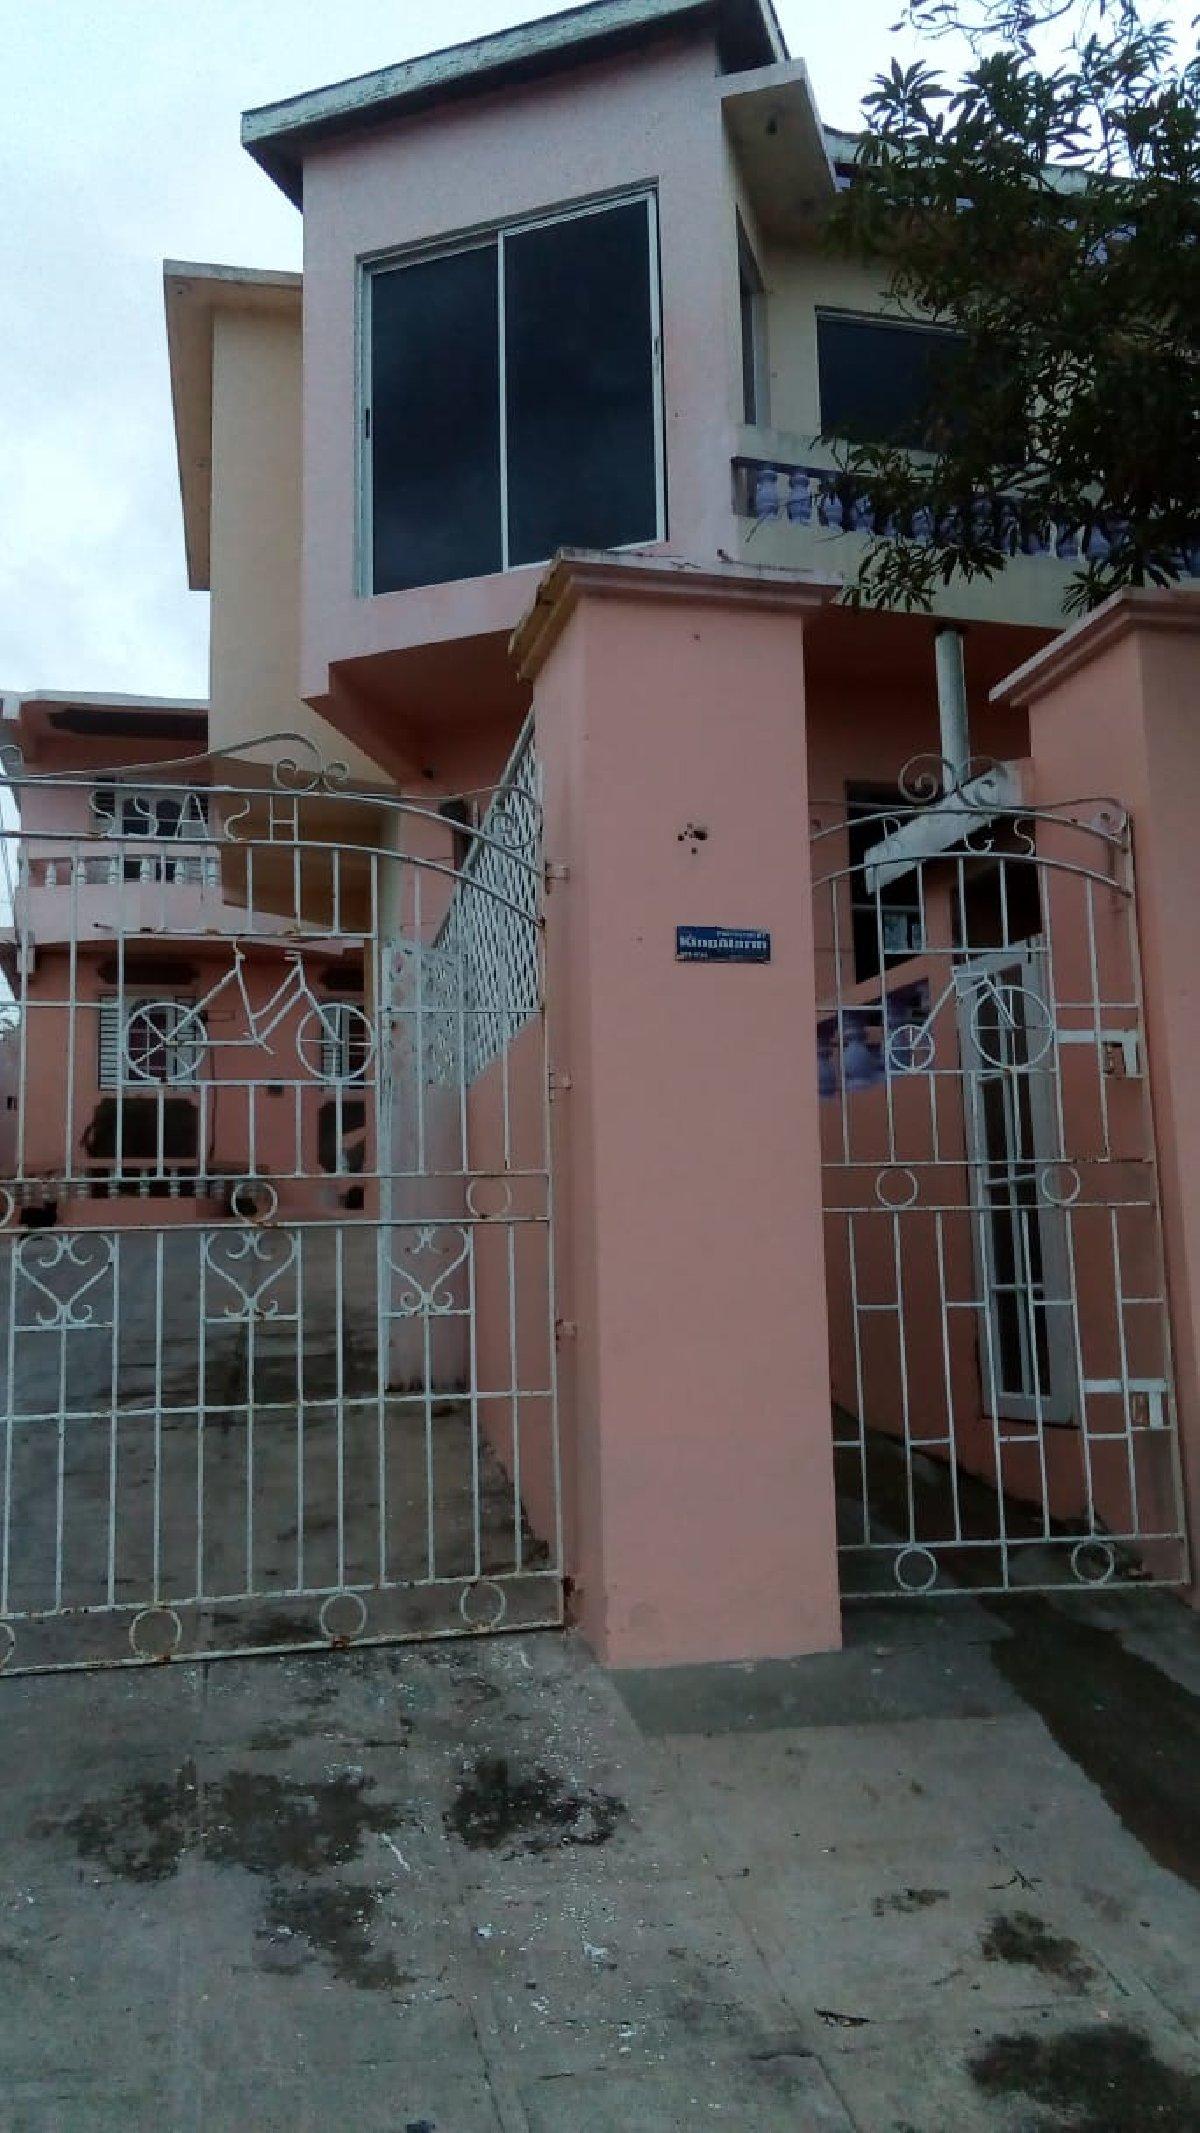 1 bedroom studio apartments for rent in portmore st - 1 bedroom or studio apartments for rent ...